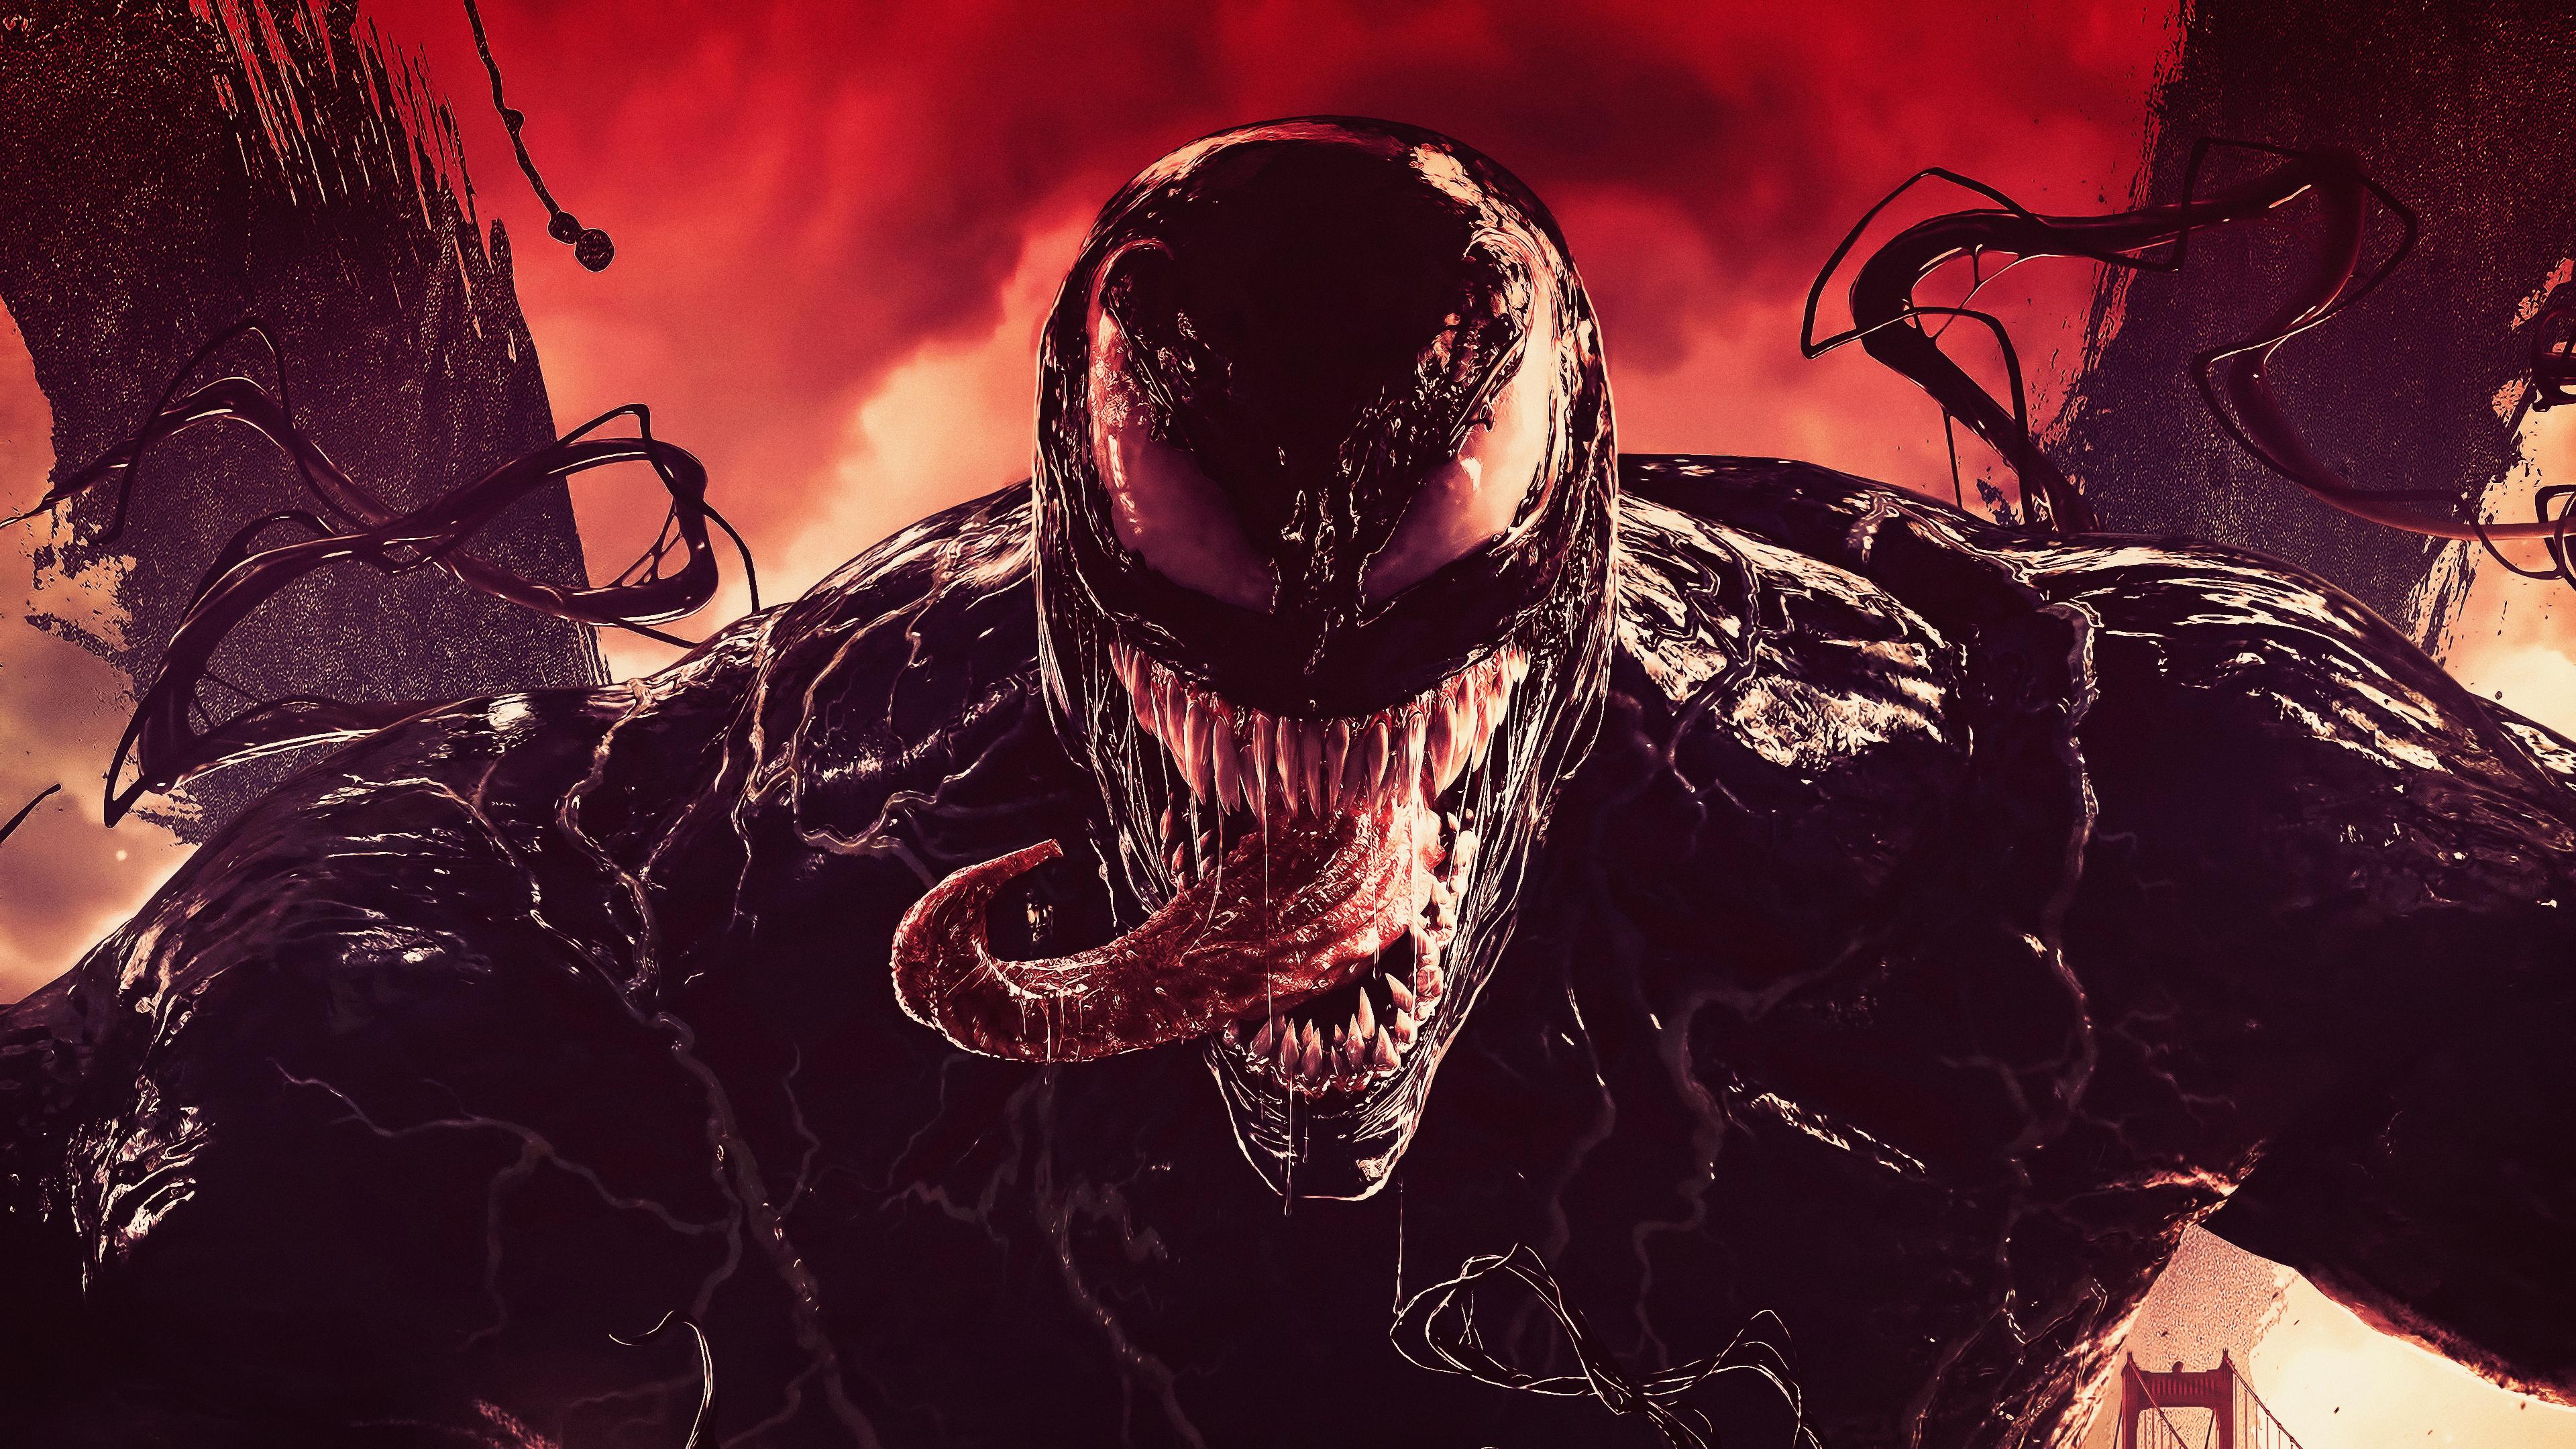 Venom tounge out digital art 4k hd superheroes 4k - 4k wallpaper venom ...